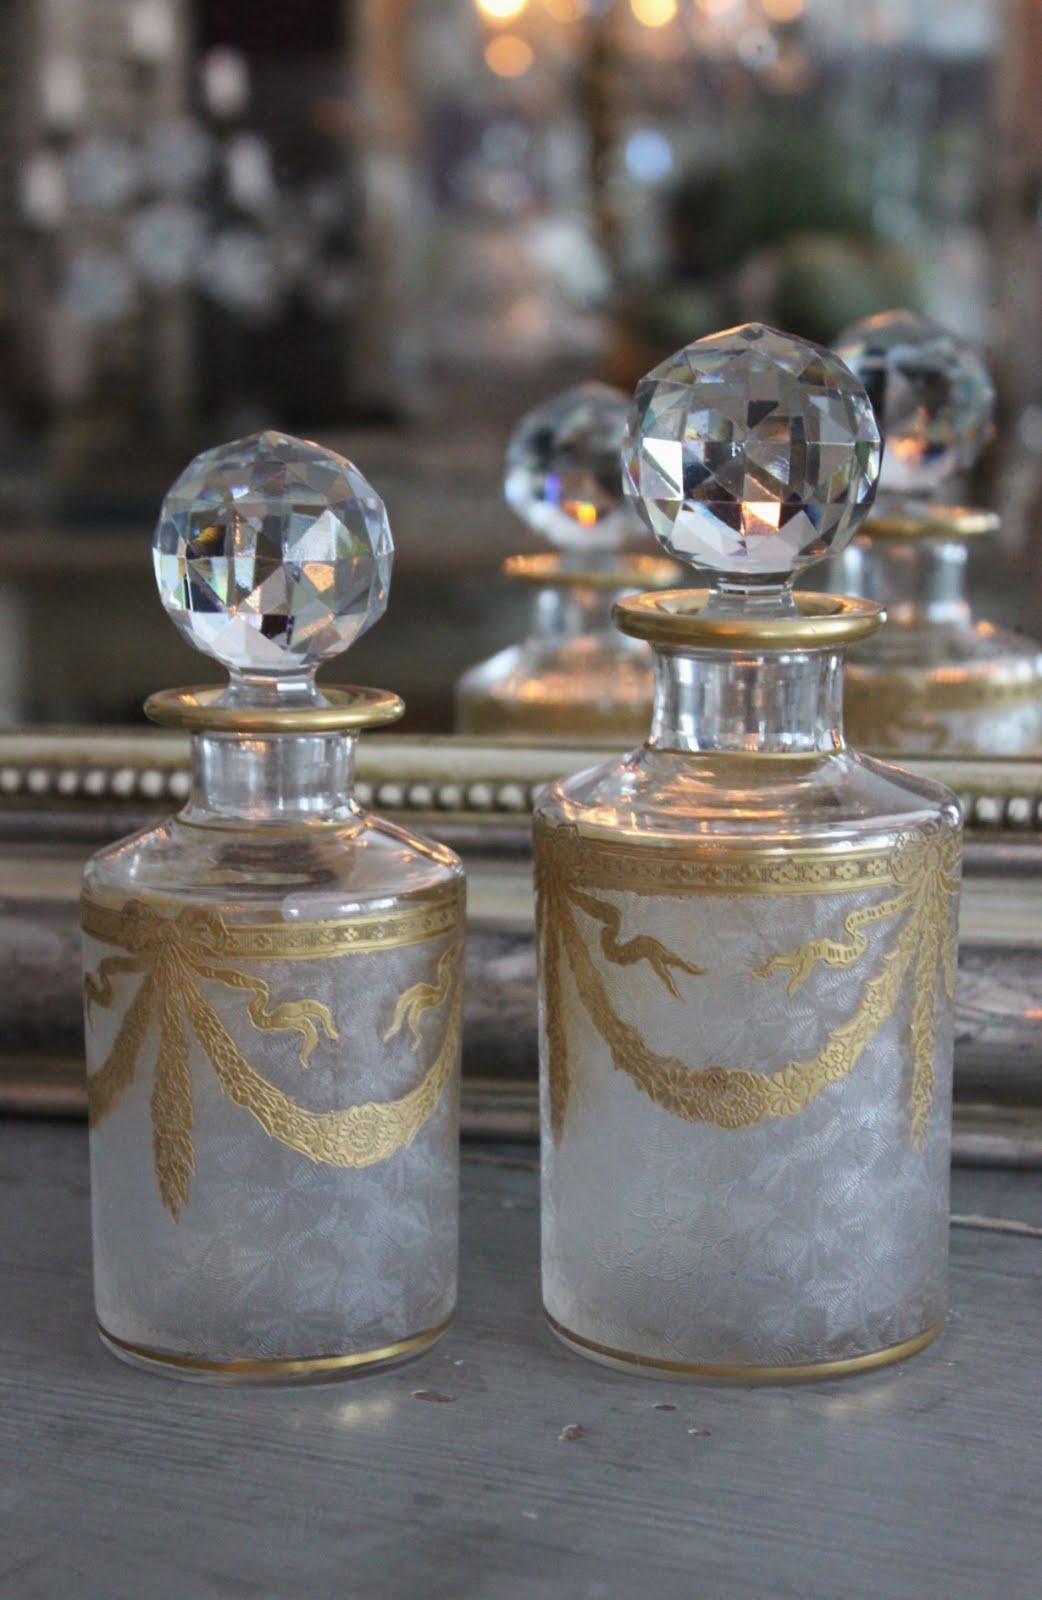 Parfume flaconer